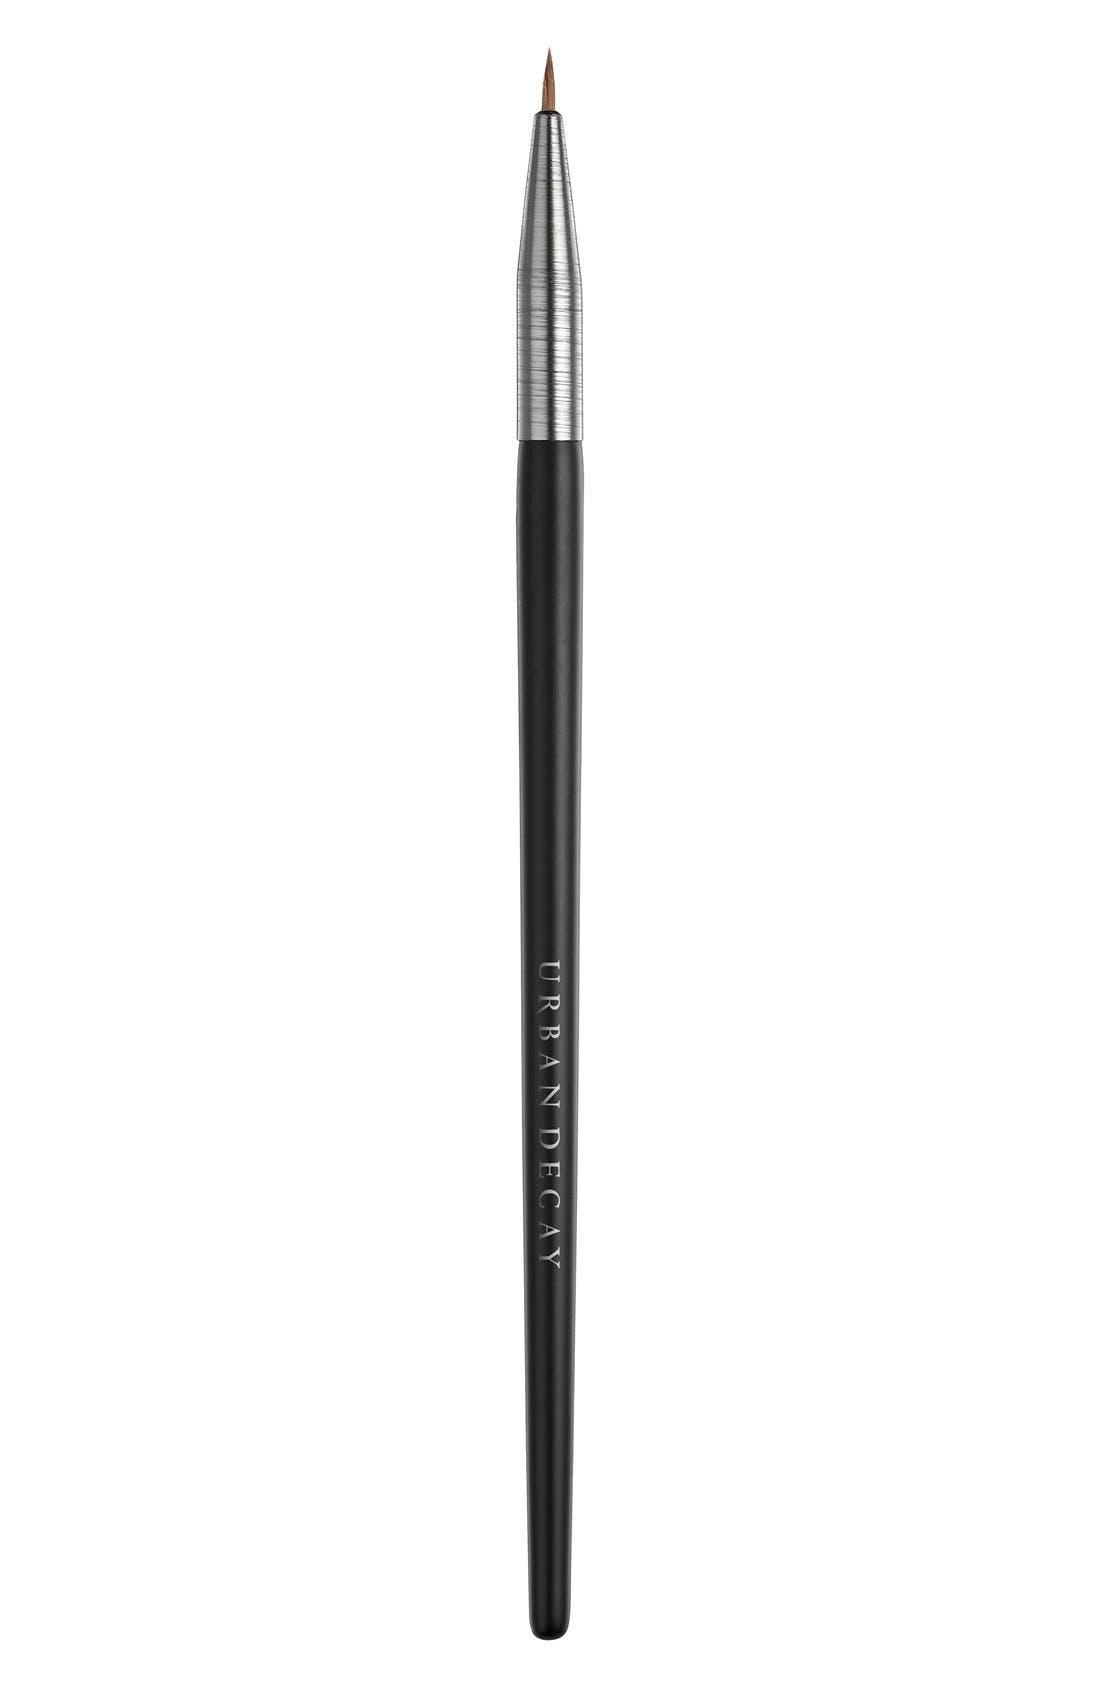 Urban Decay Pro Precise Eyeliner Brush